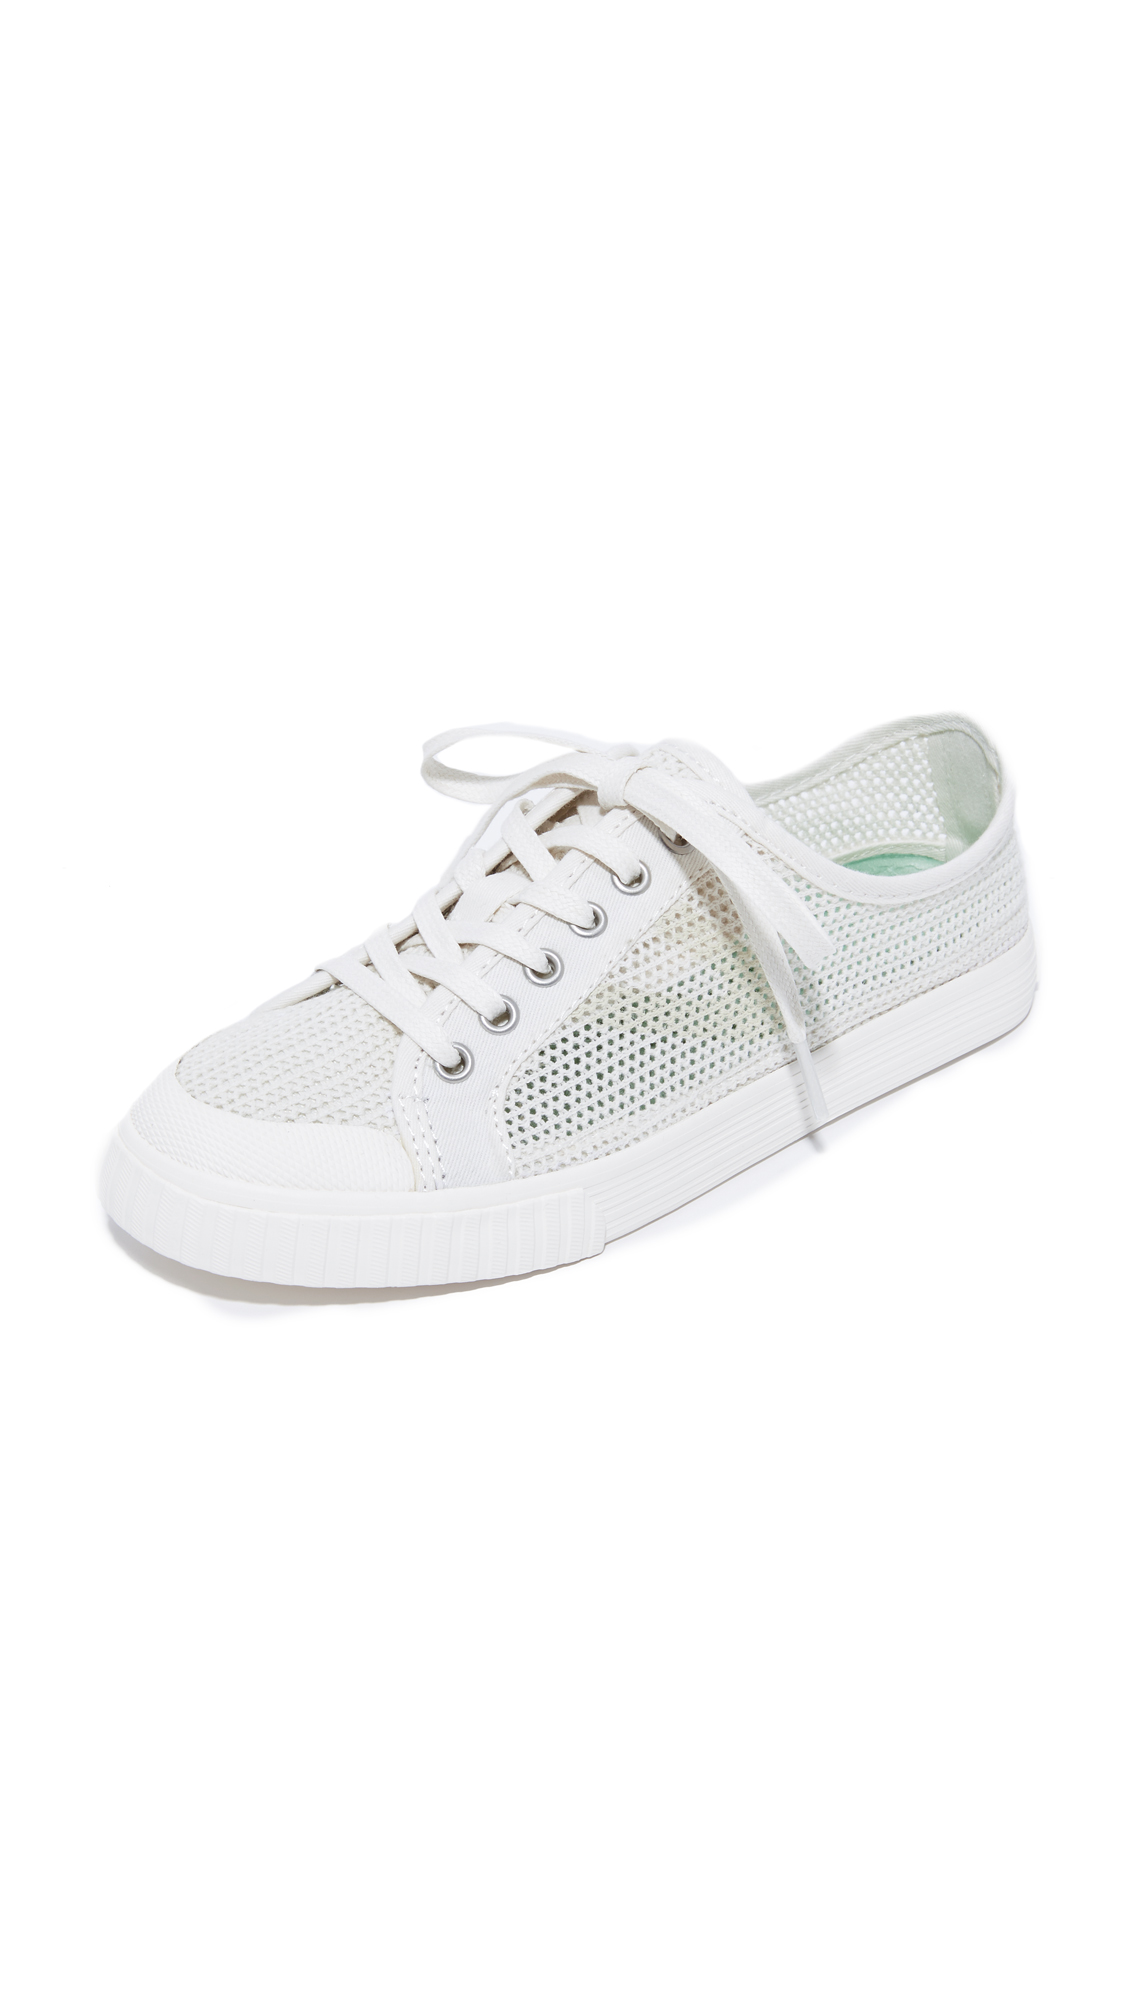 Tretorn Tournament Net Sneakers - Vintage White